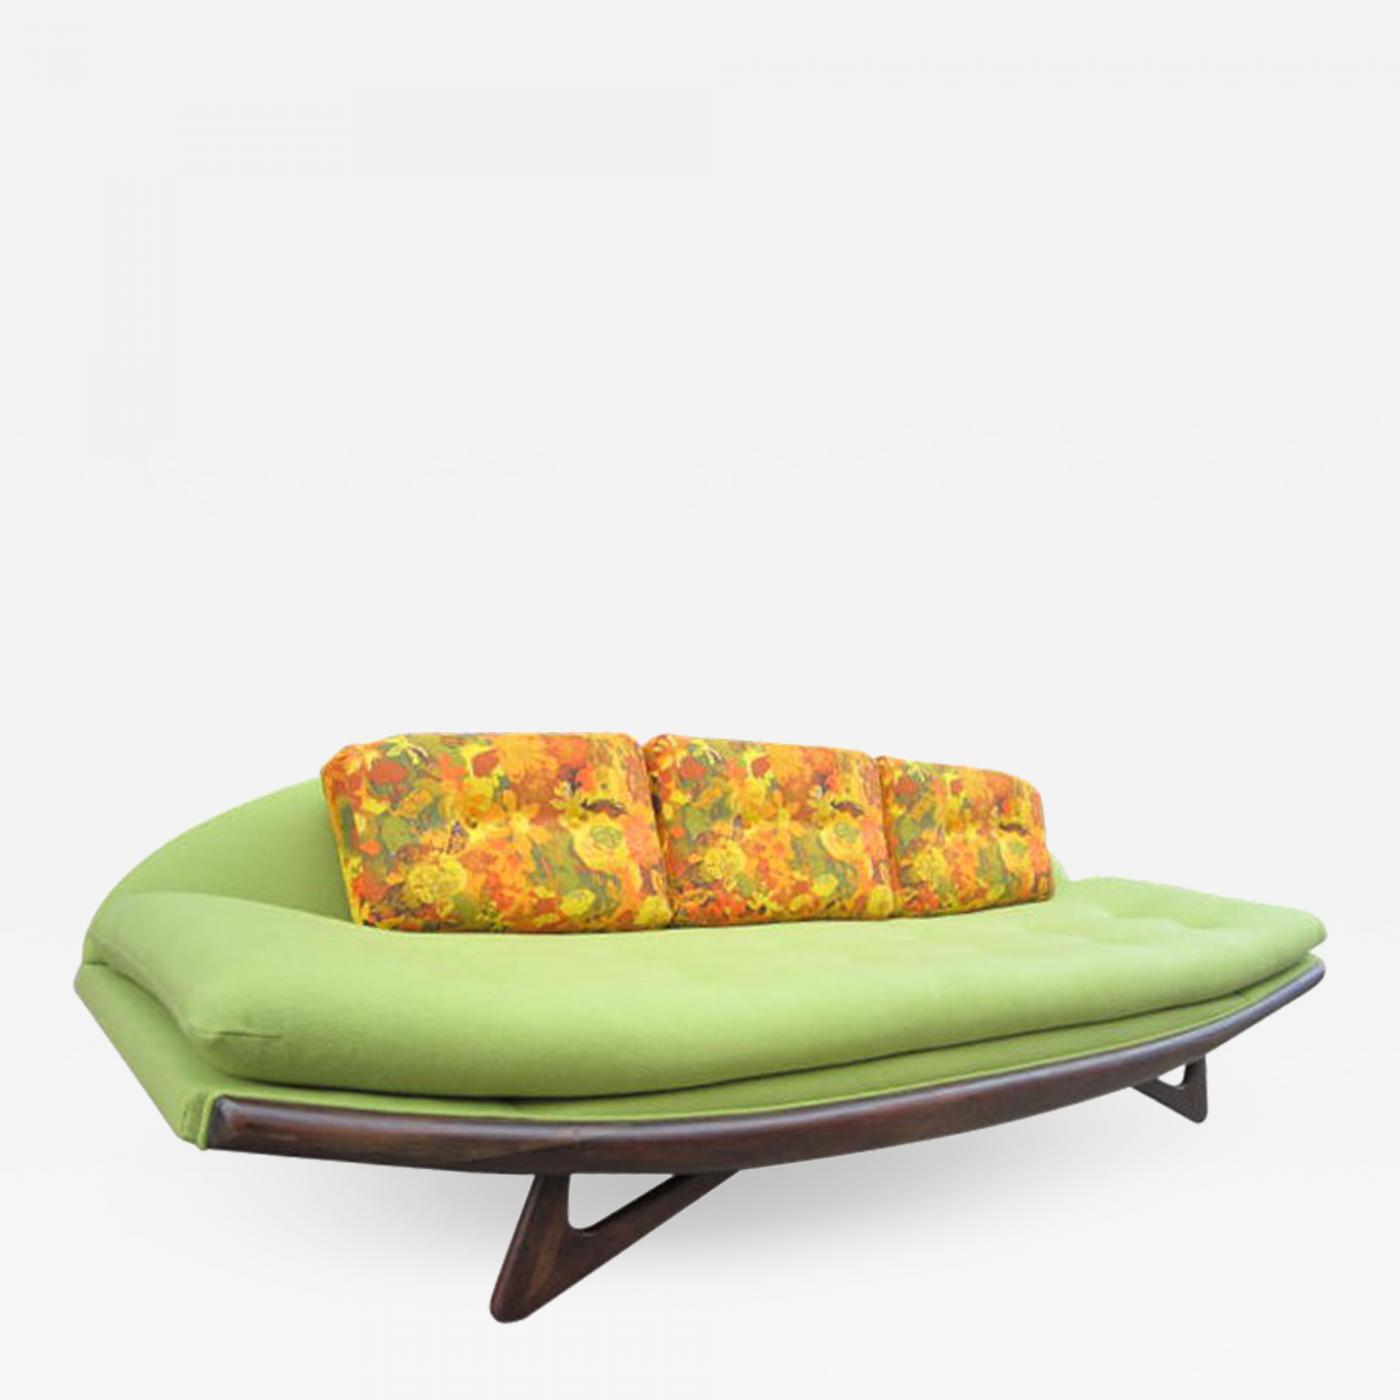 Terrific Adrian Pearsall Adrian Pearsall Sculptural Walnut Gondola Sofa Fully Restored Midcentury Creativecarmelina Interior Chair Design Creativecarmelinacom